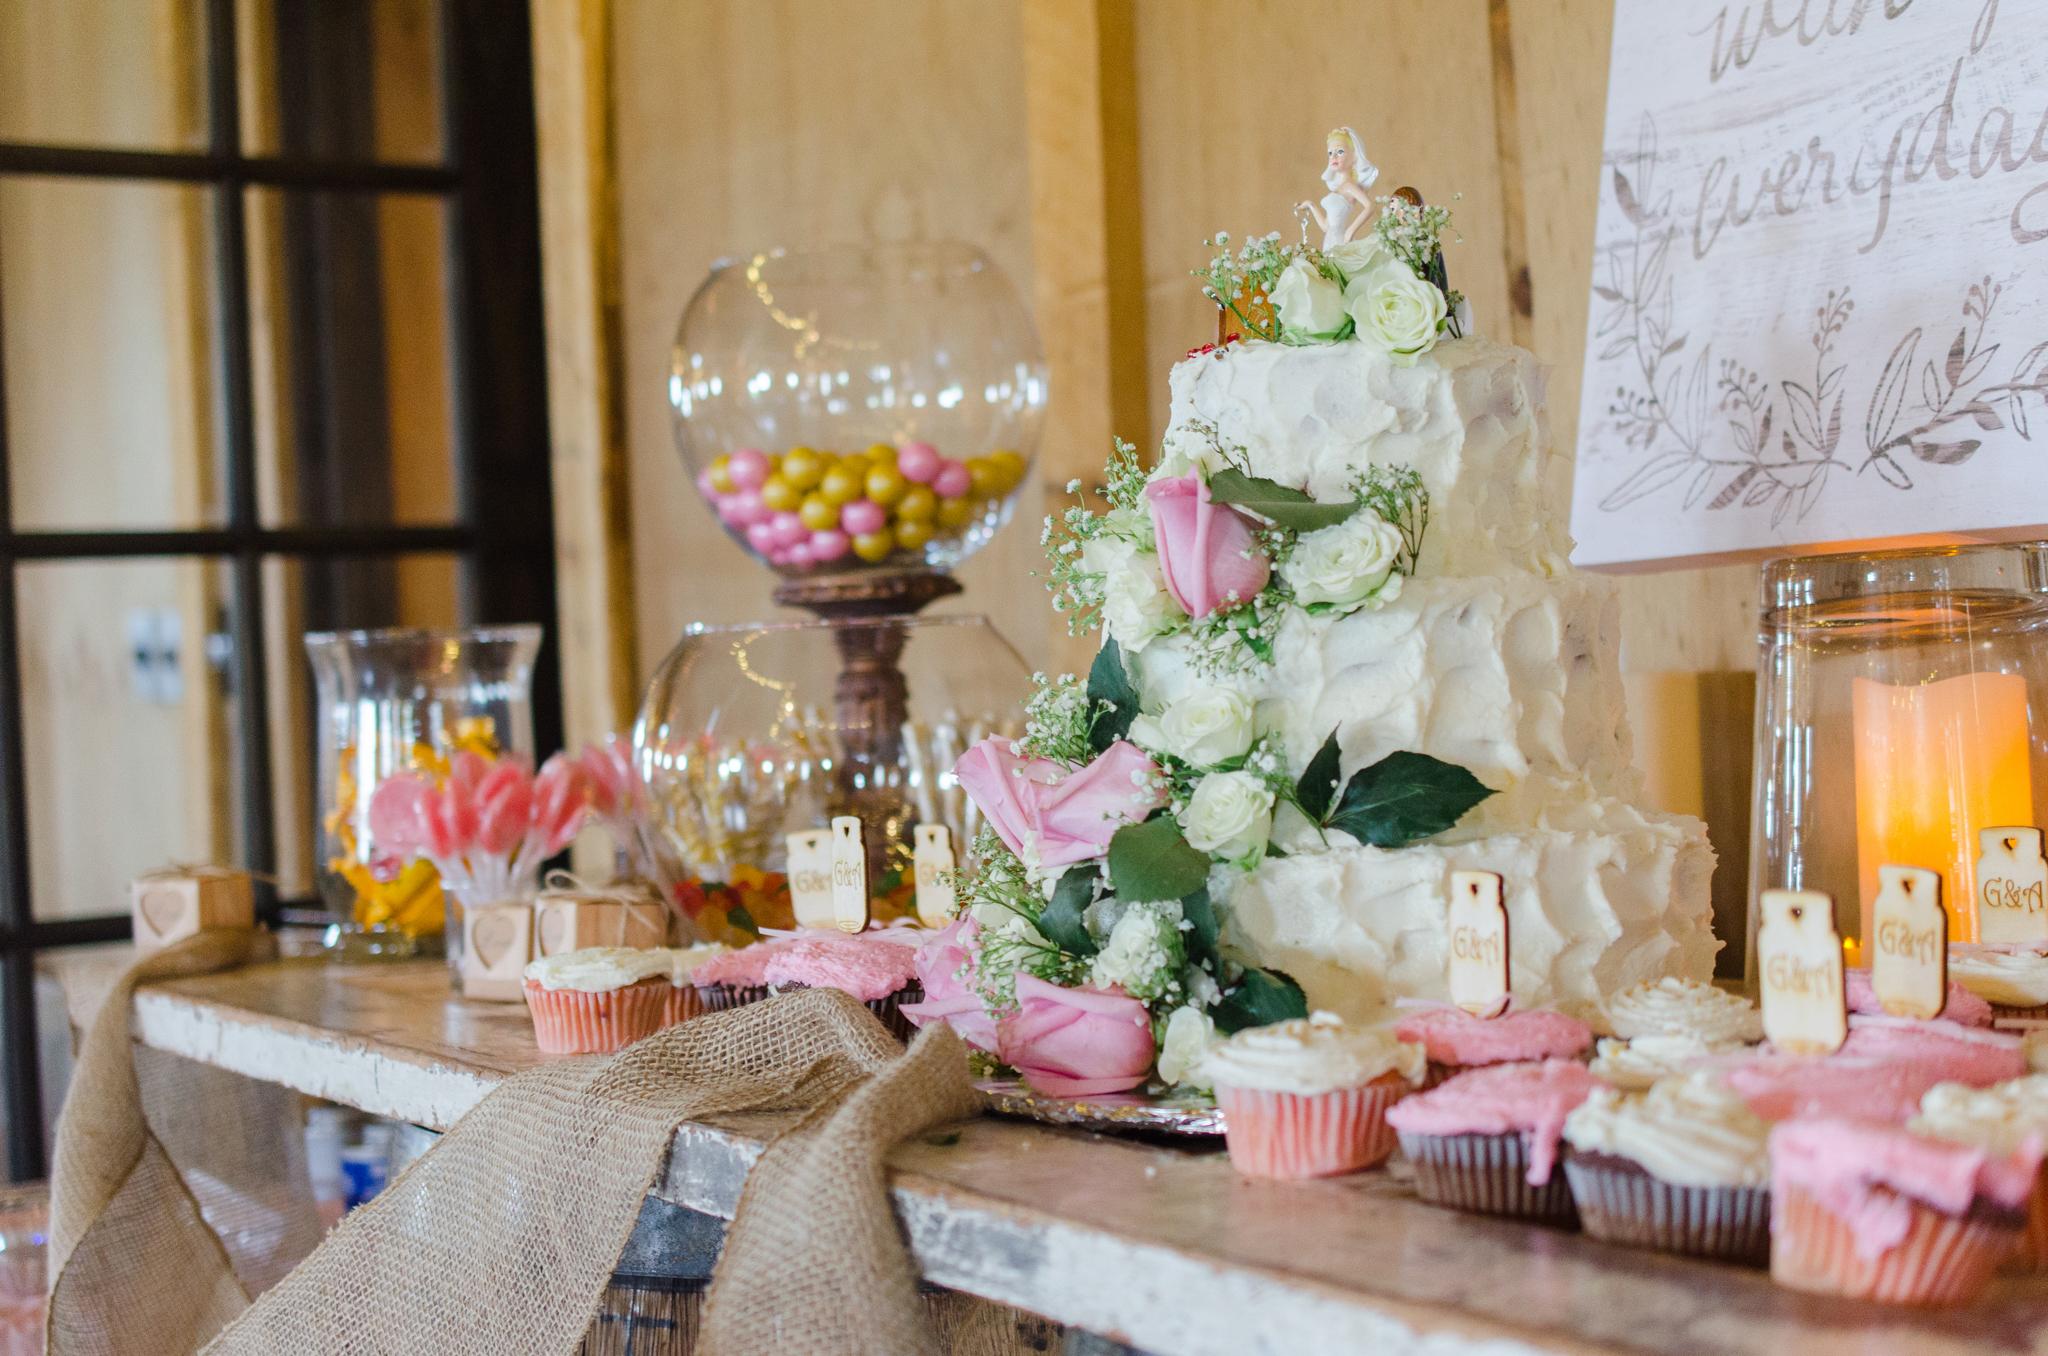 Wedding cake, cake, barn wedding, Josephina Event Venue, Dry Ridge, Lexington, Louisville, West Chester, Mt Sterling, Ashland